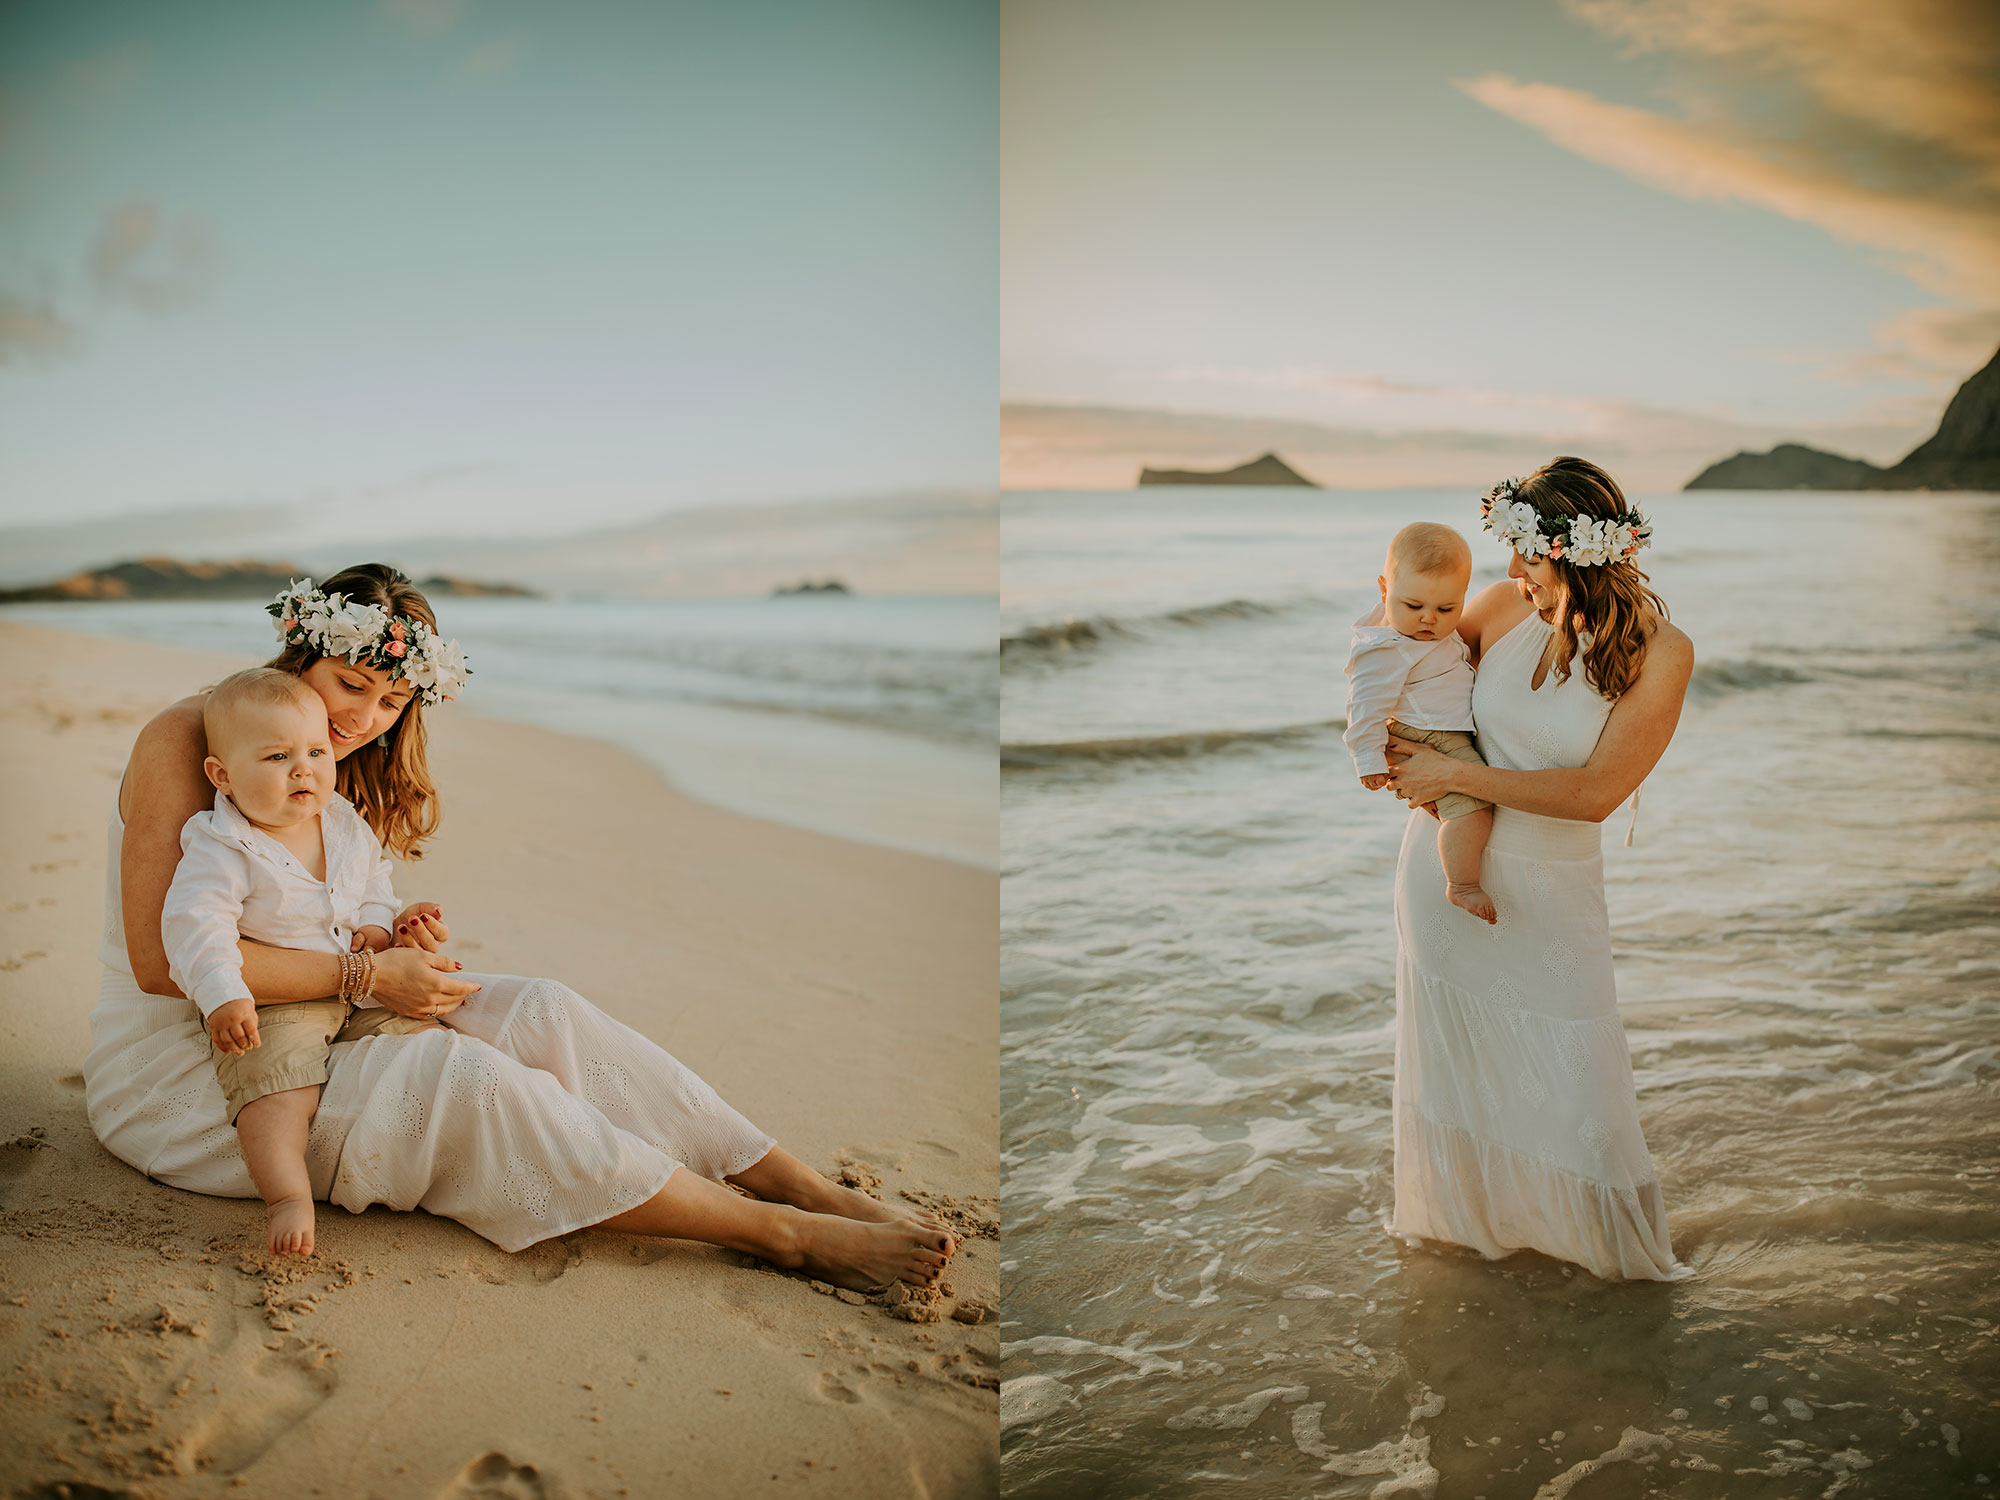 Hawaii-Oahu-Family-Photographer-09.jpg